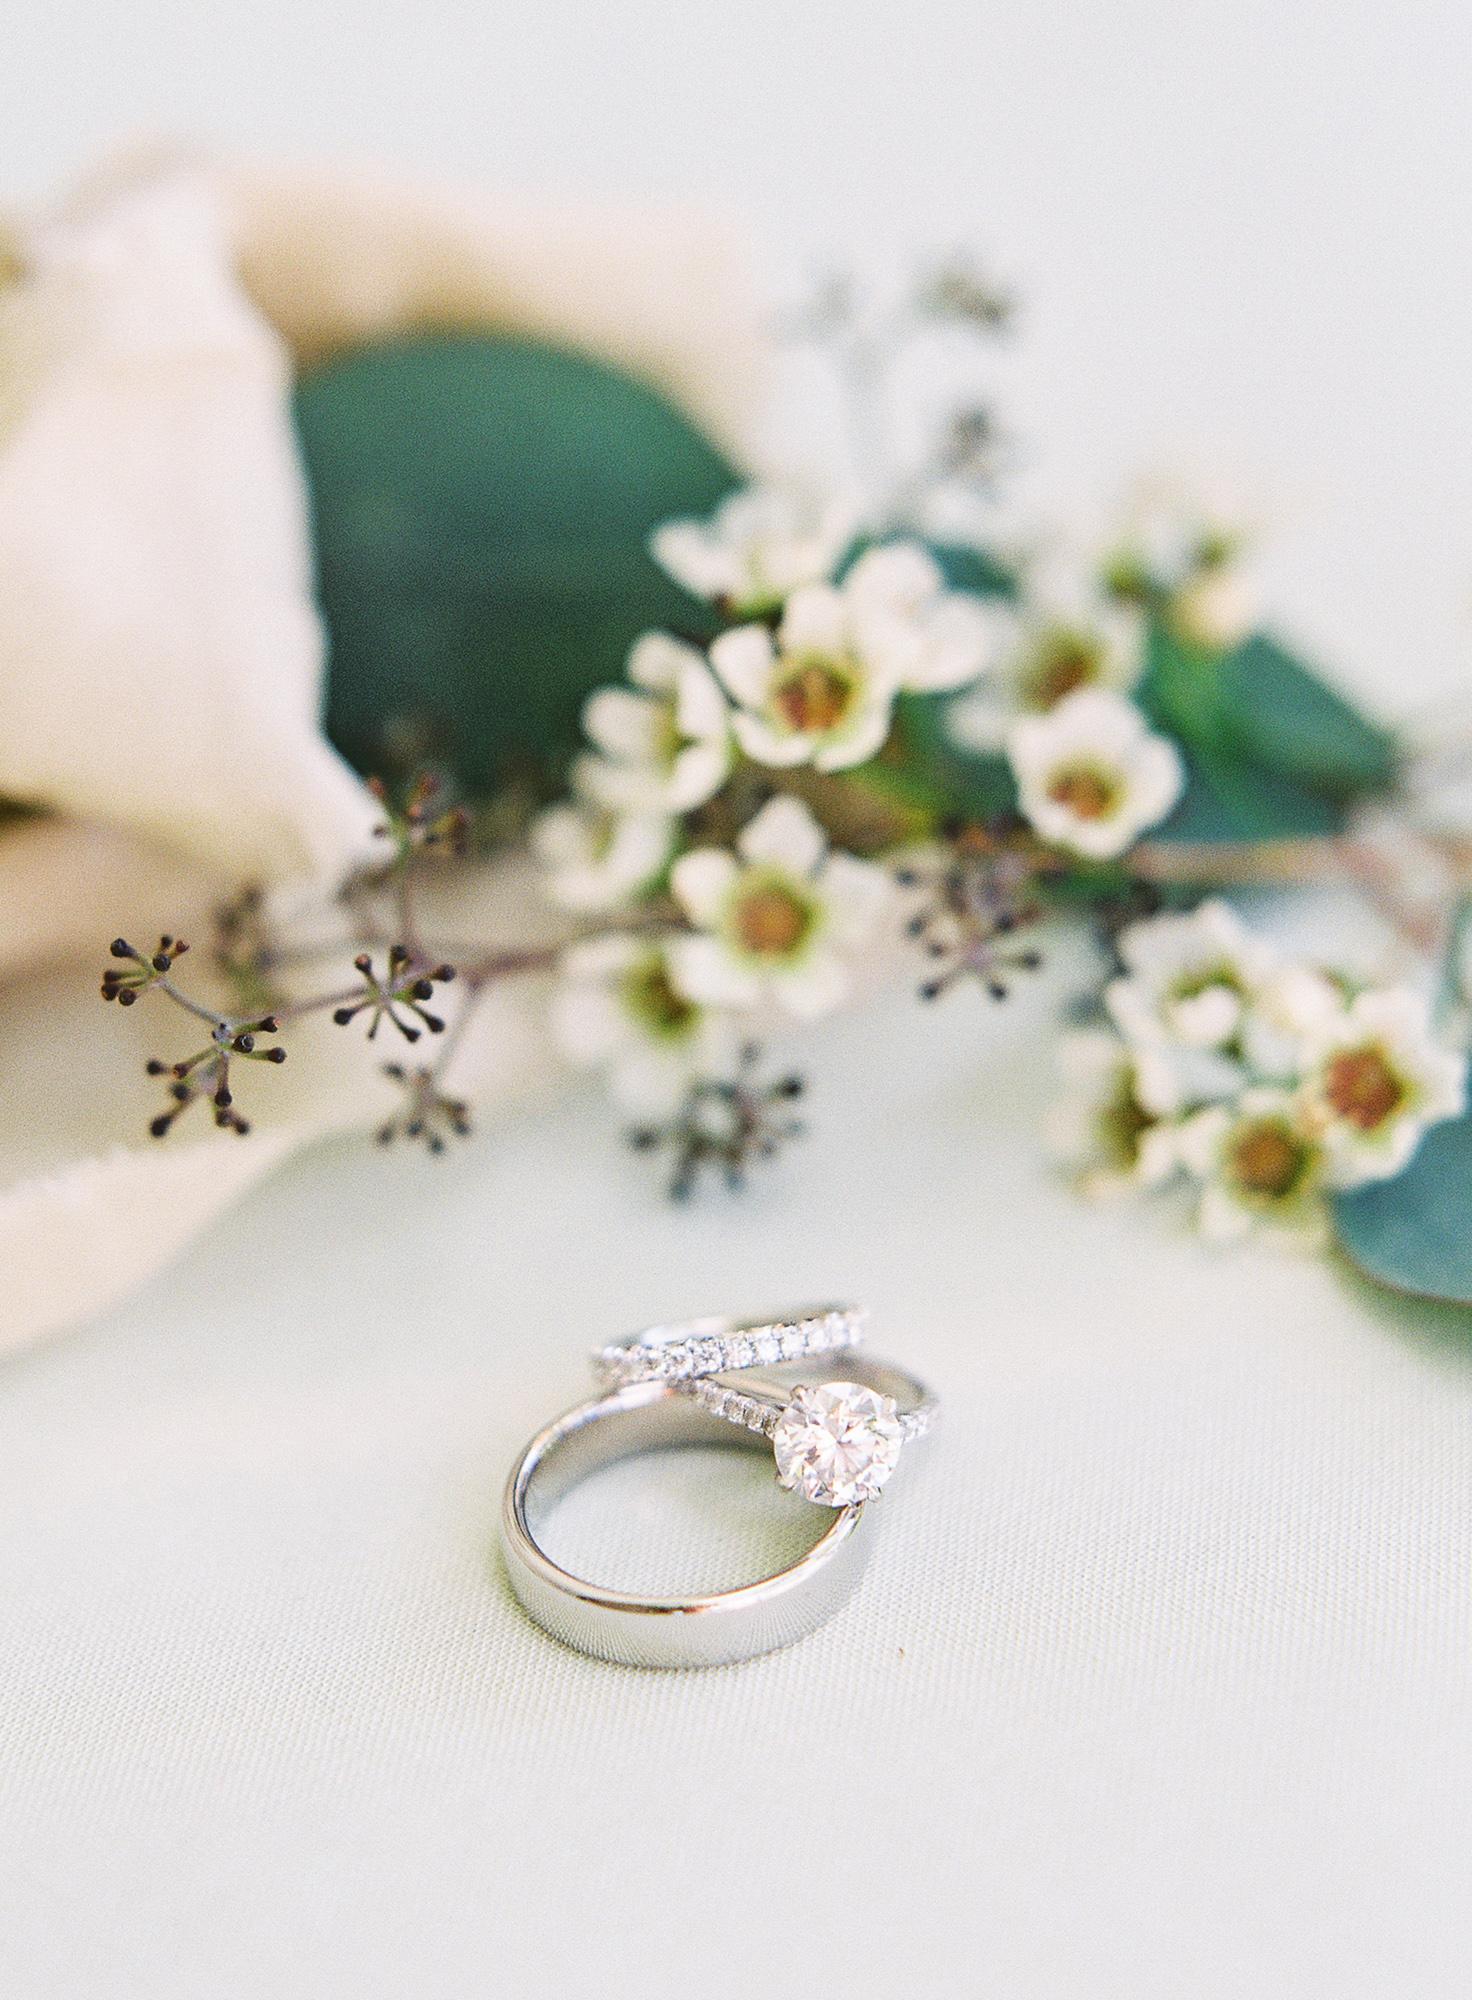 Gerry-Ranch-Wedding-Photography-Kristina-Adams-1.jpg